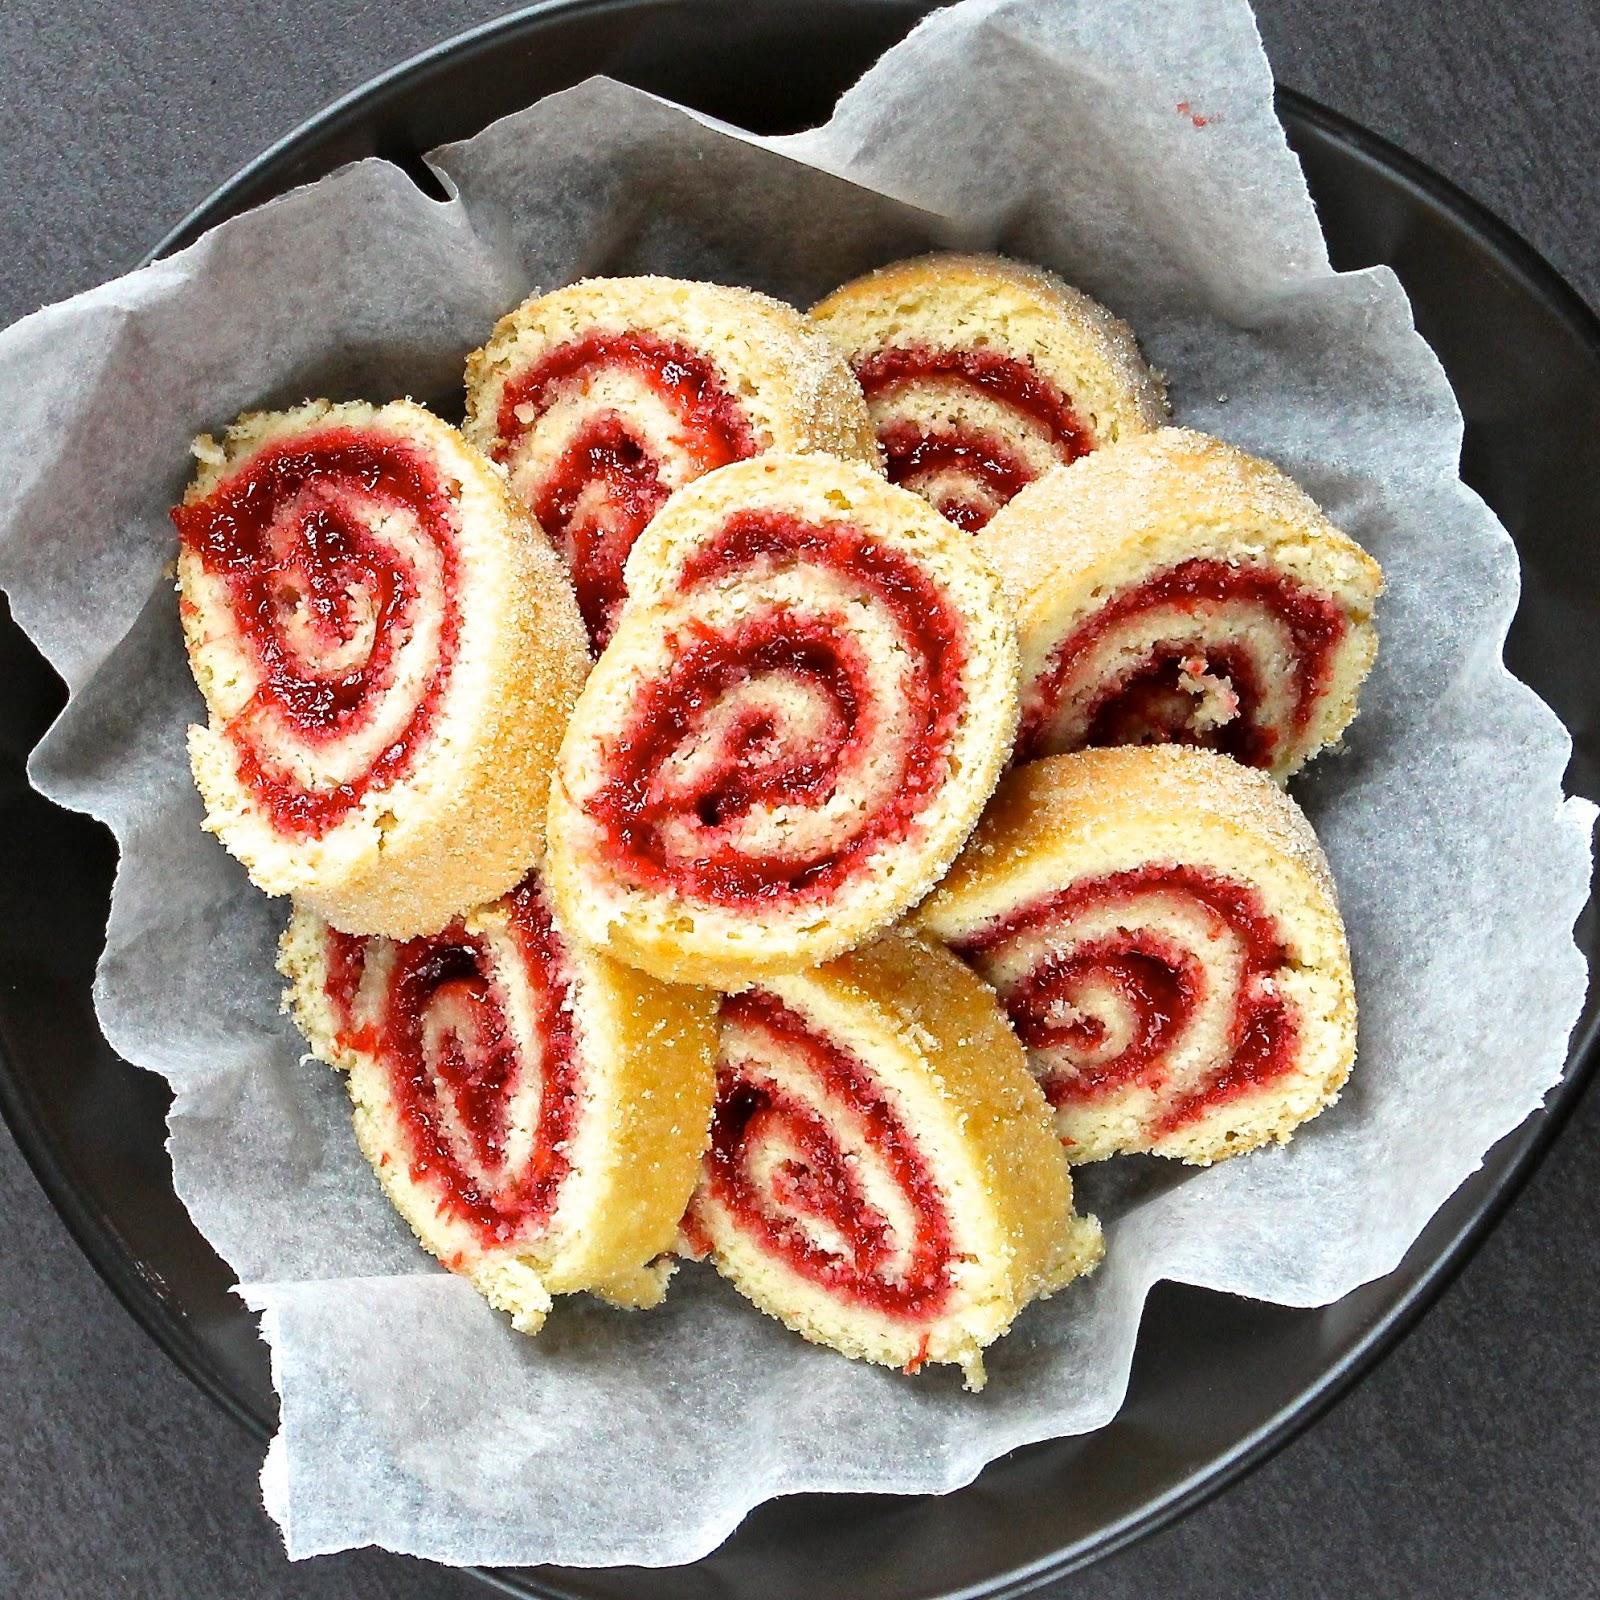 how to make gluten free rolls